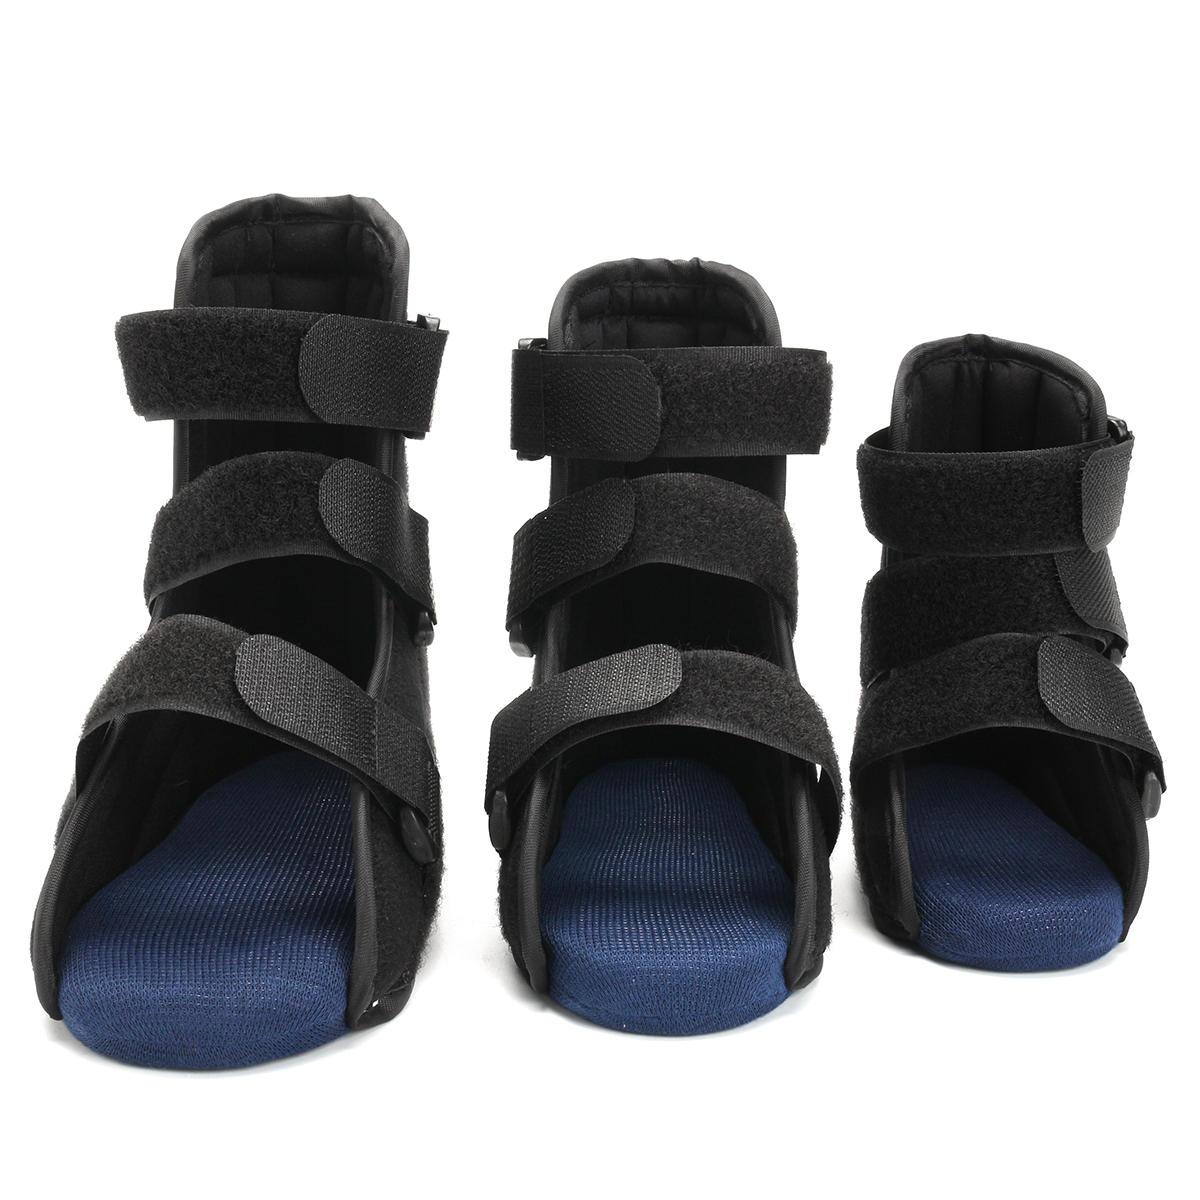 Kid Medical Ankle Splint Boot Brace Support Tendonitis Plantar Fasciitis